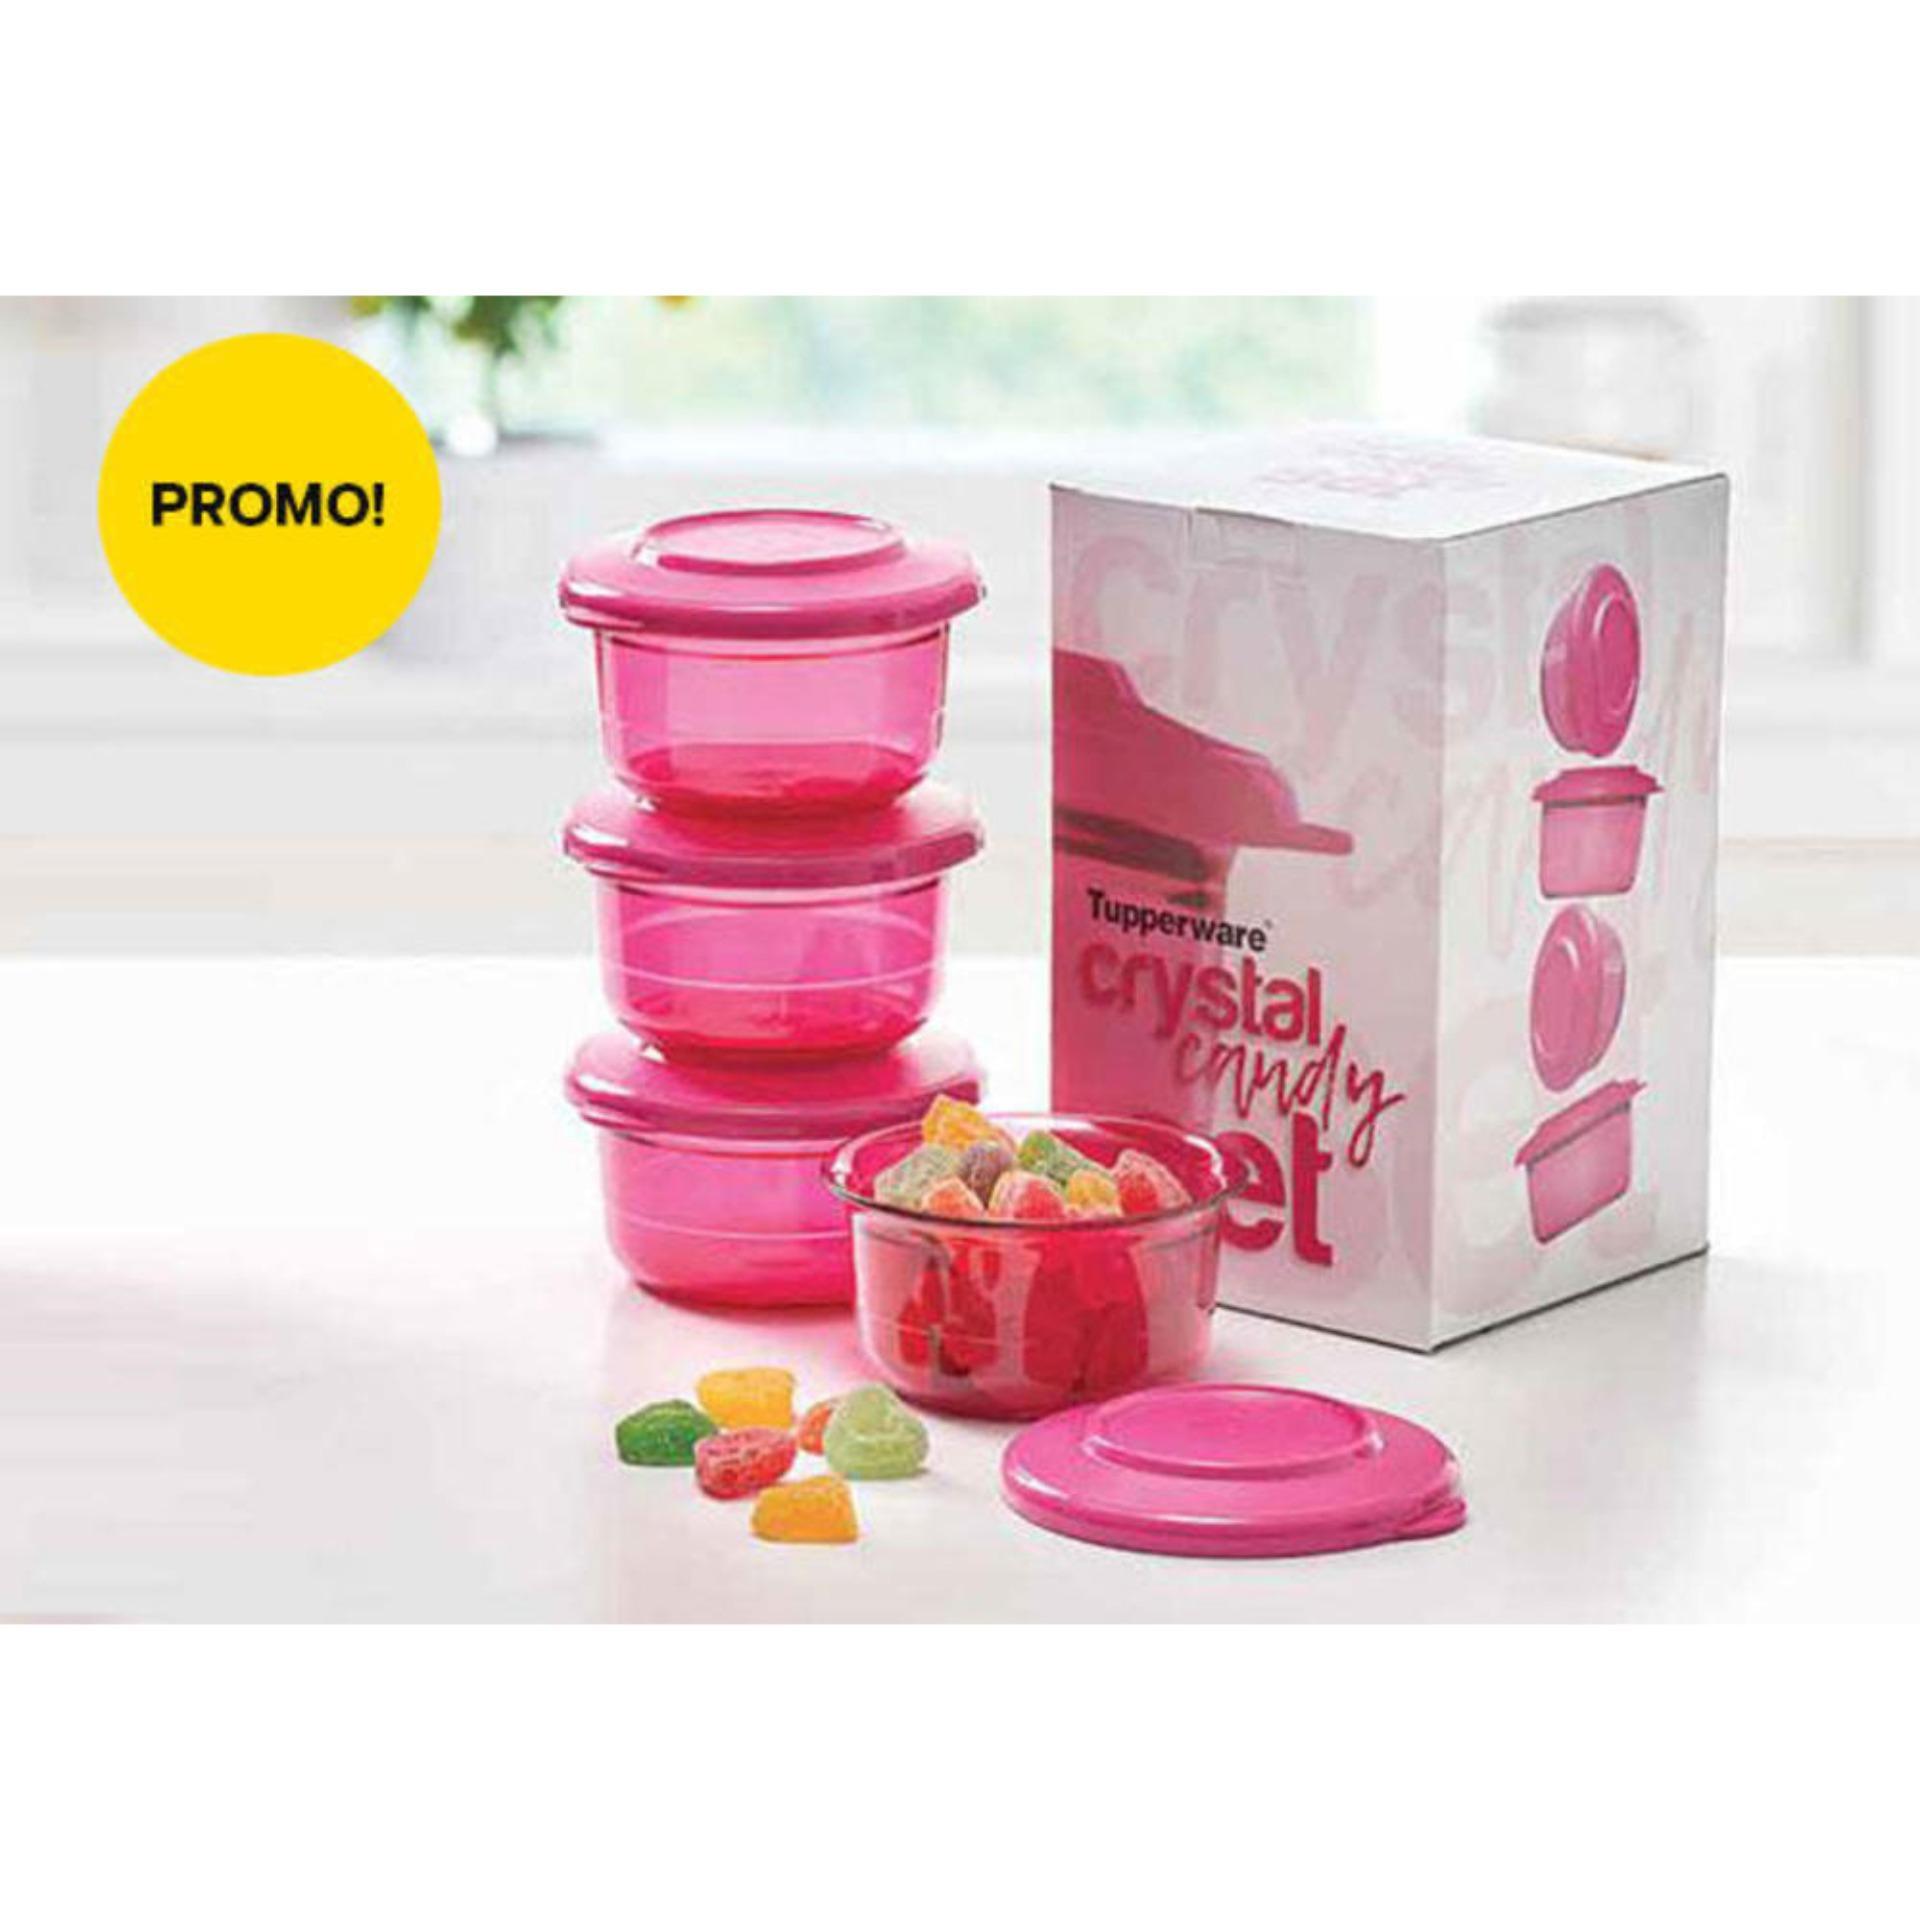 Jual Tupperware Terbaik Promo New Eco Botol Minum Hijau 2 L Crystal Candy Set 4 Toples Kecil Cantik Oktober 2018